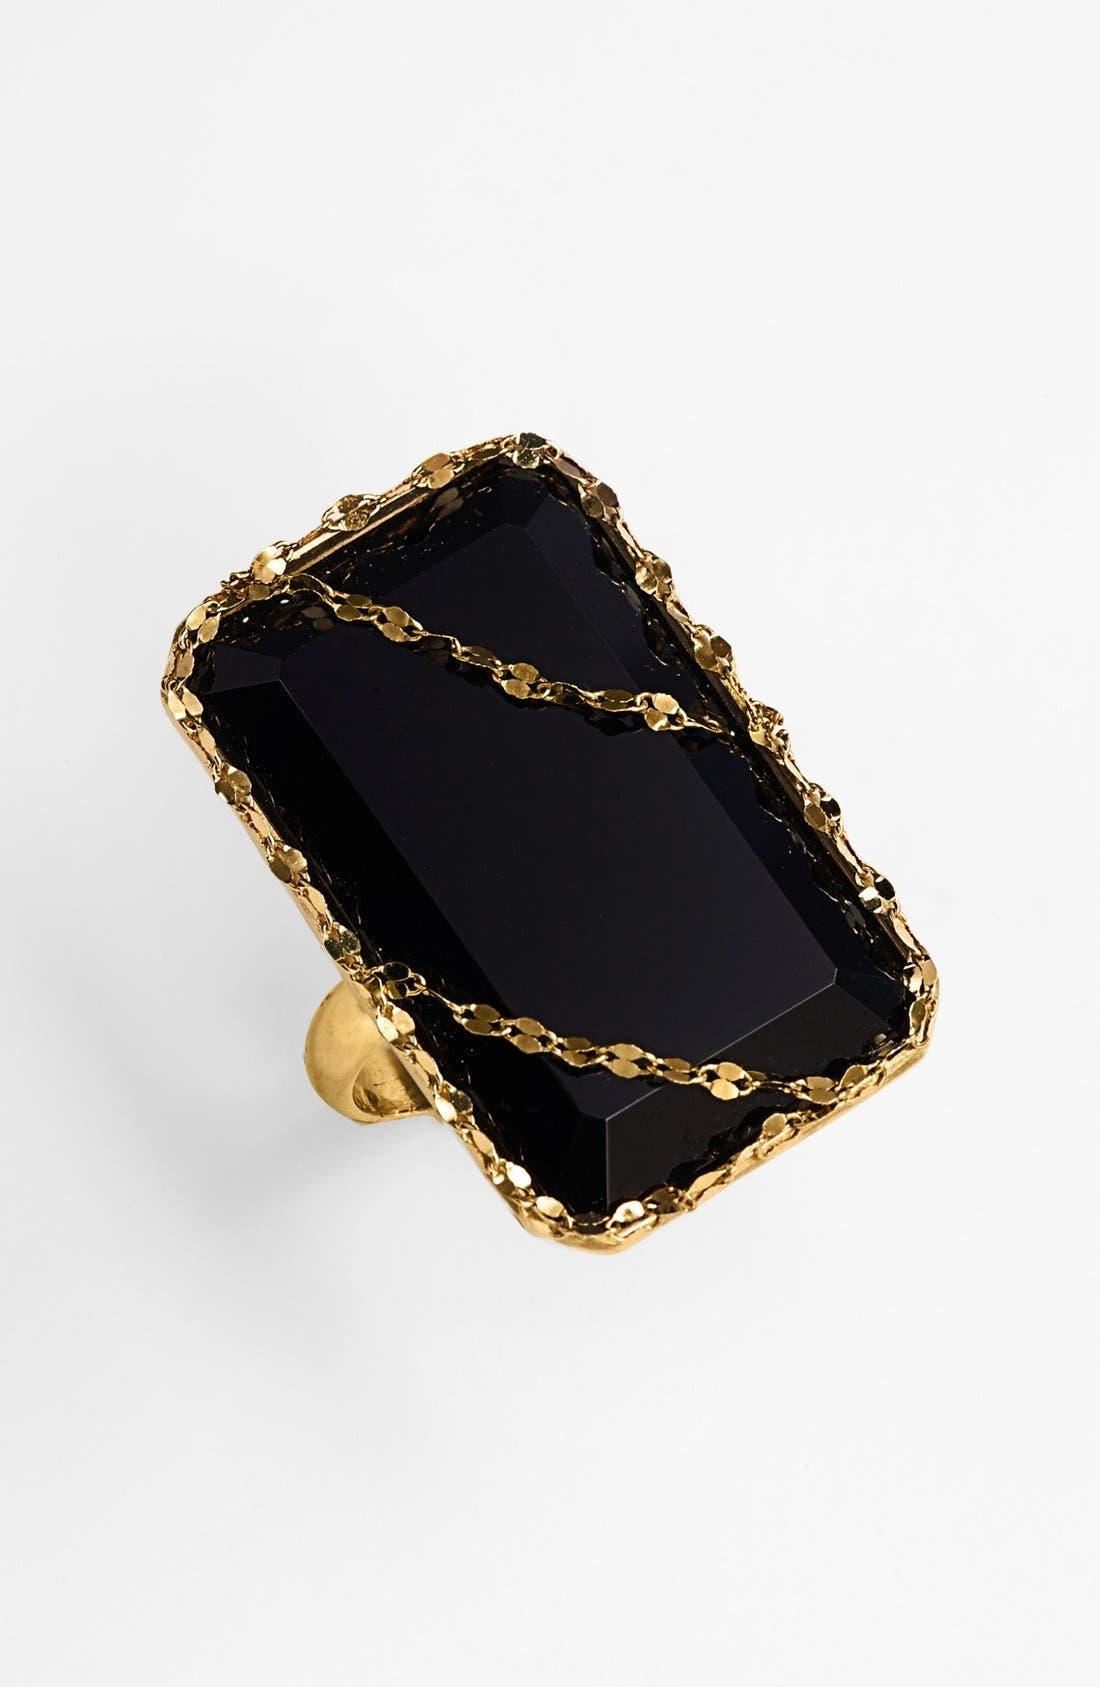 Alternate Image 1 Selected - Lana Jewelry 'Spellbound - Noir' Stone Ring